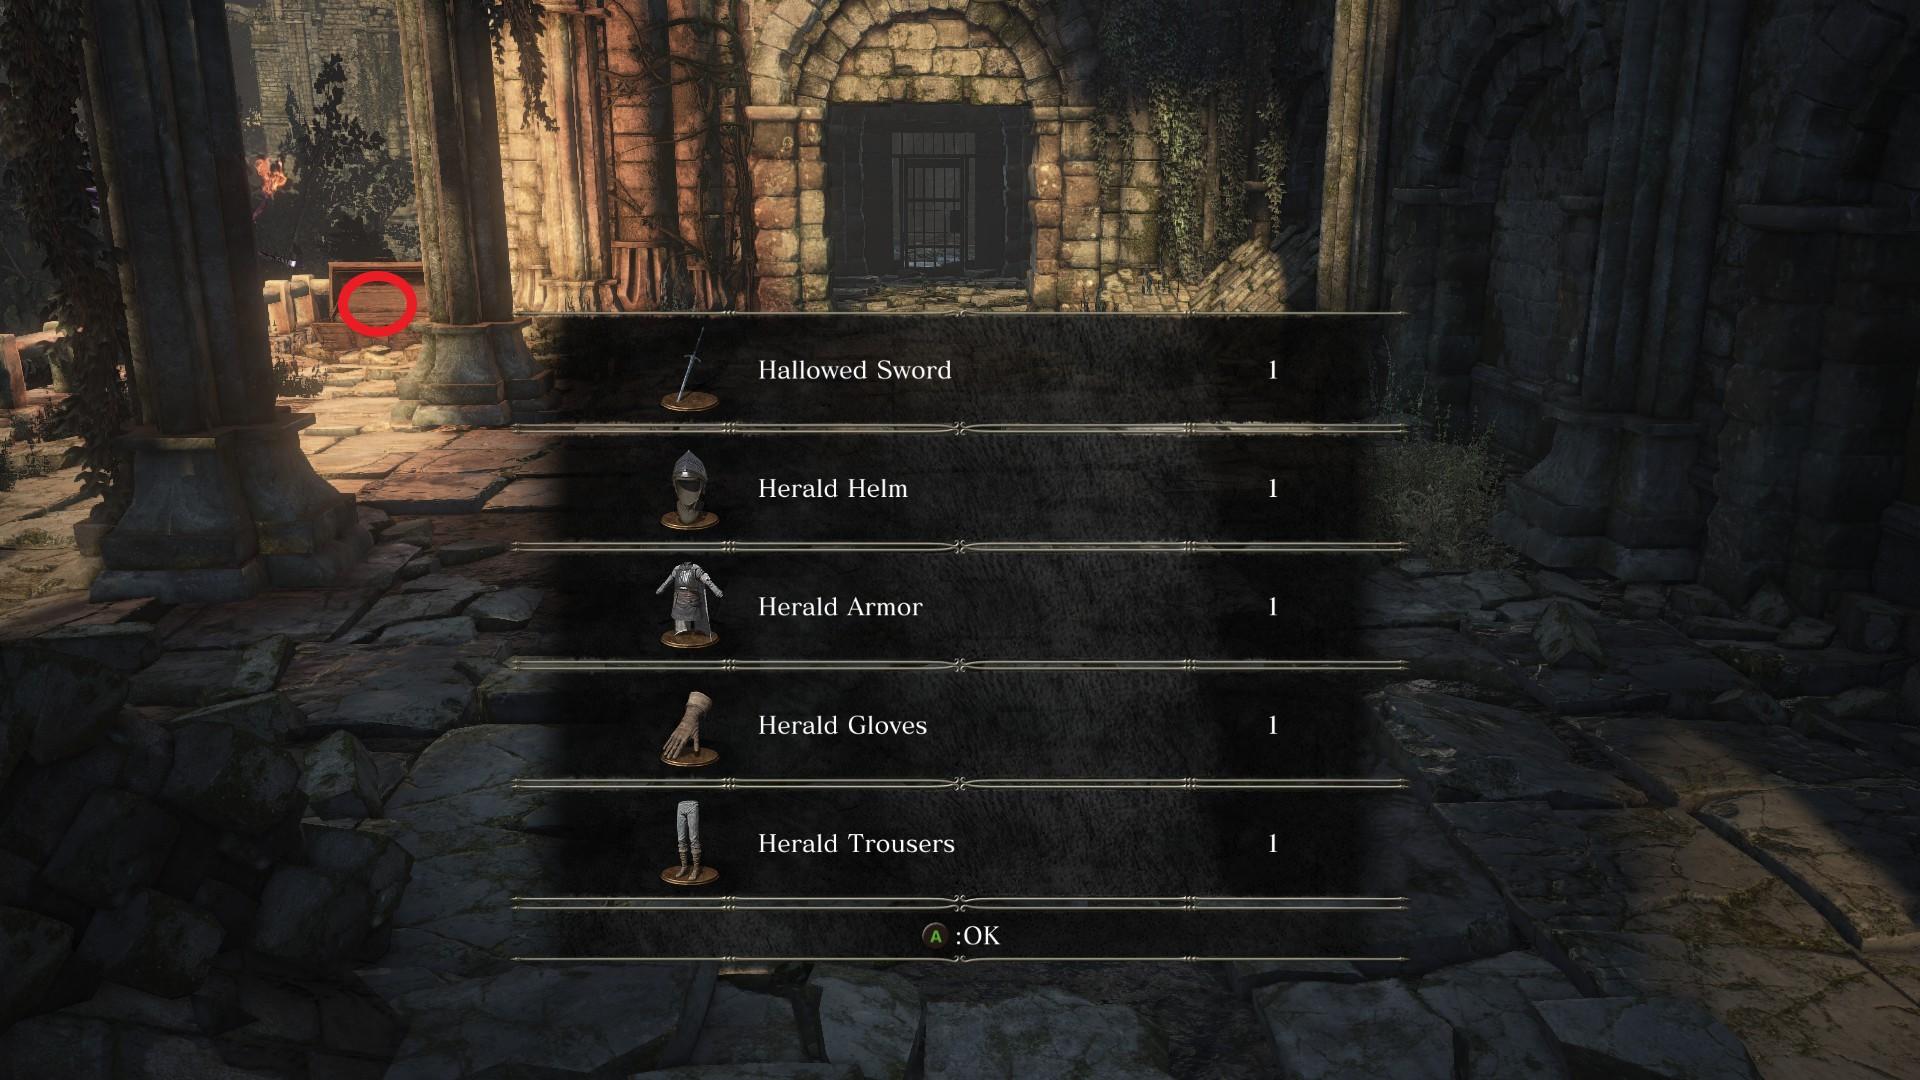 Herald_Set_and_Hallowed_Sword.jpg